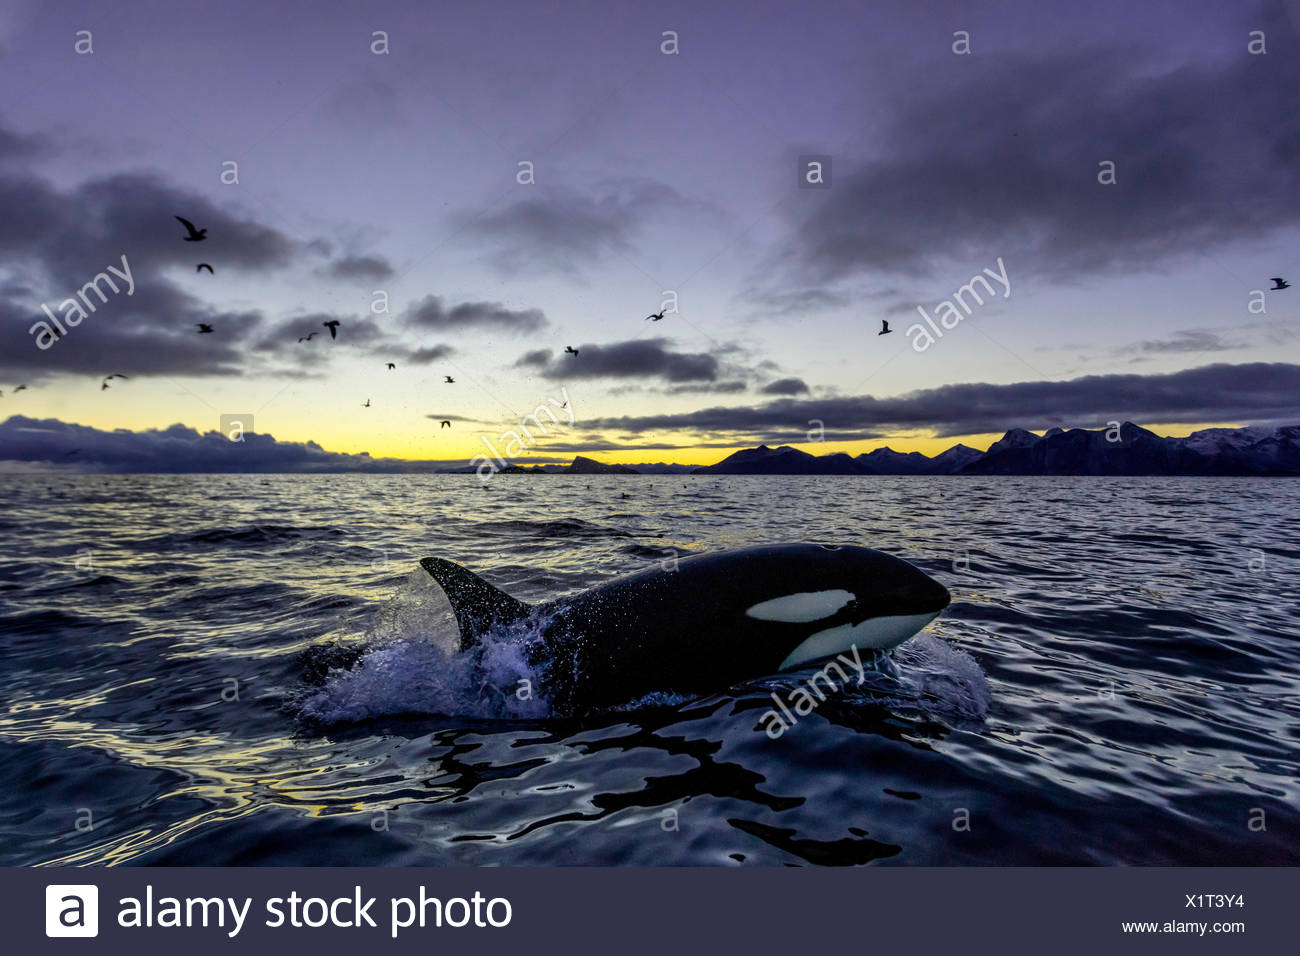 Orca (Orcinus orca) emerges, sunset, mountains at back, Kaldfjorden, Tromvik, Norway - Stock Image